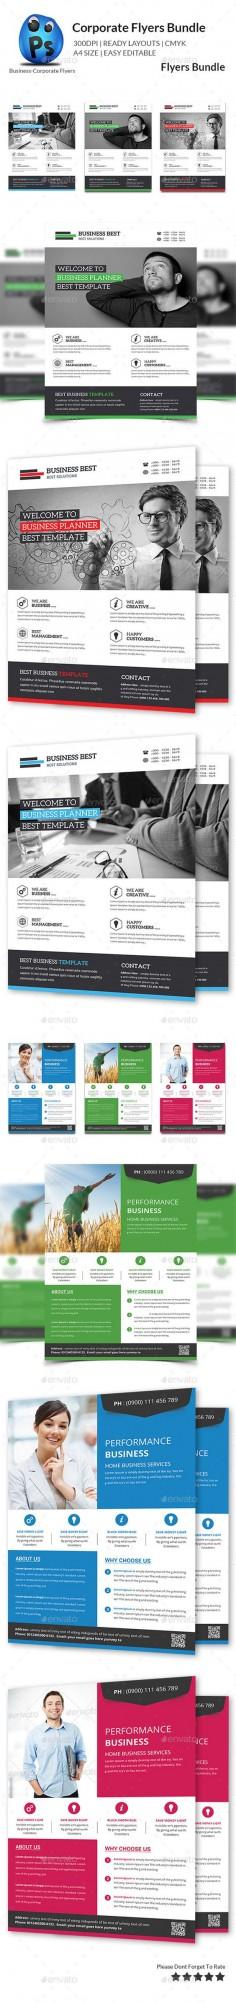 Multipurpose Business Flyer Bundle - Flyers Print Templates